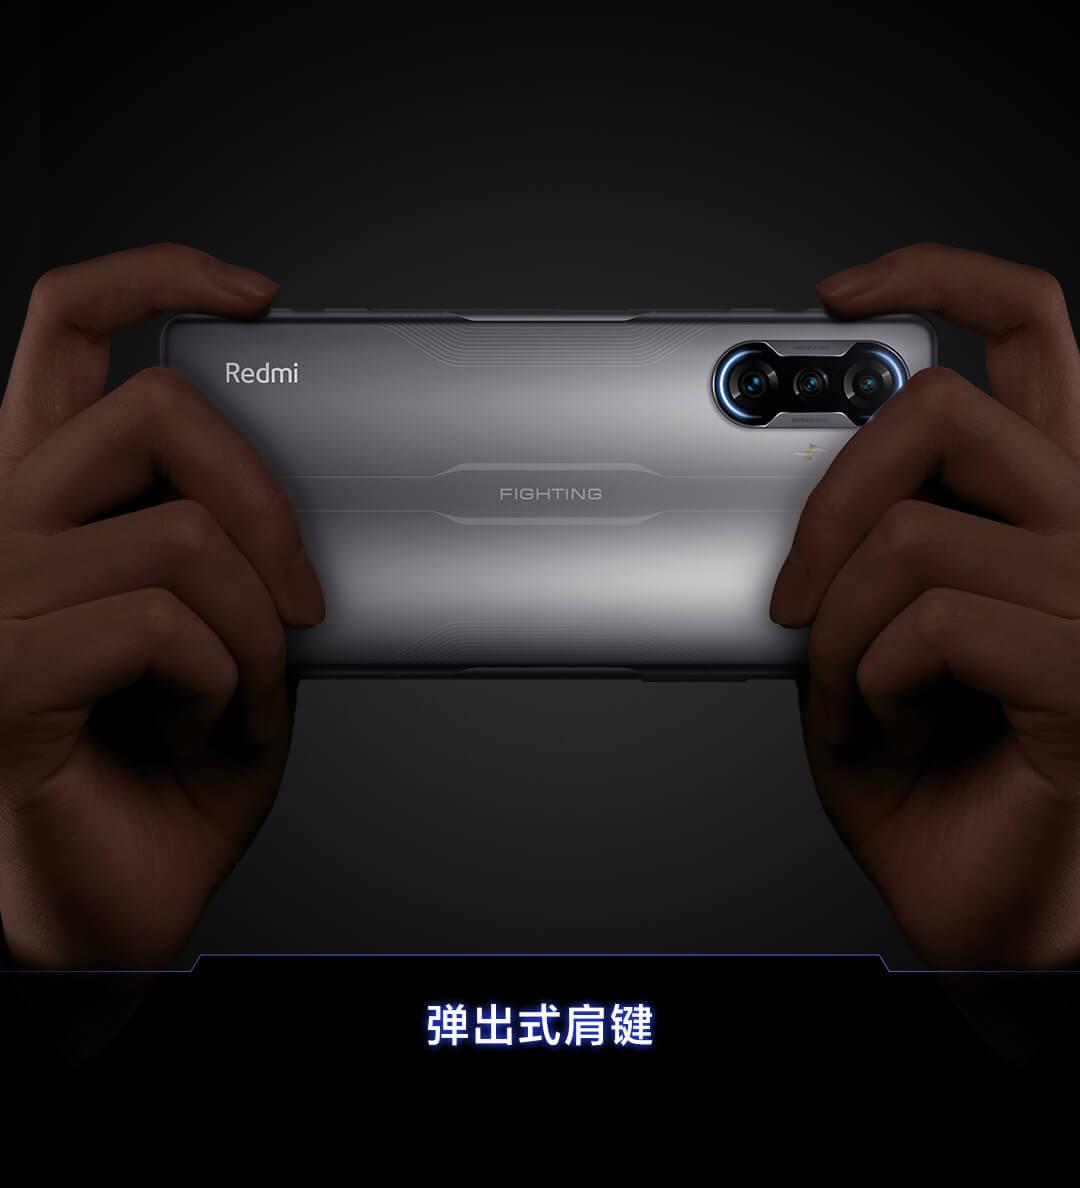 redmi-k40-gaming-12-256-gb-brand-new